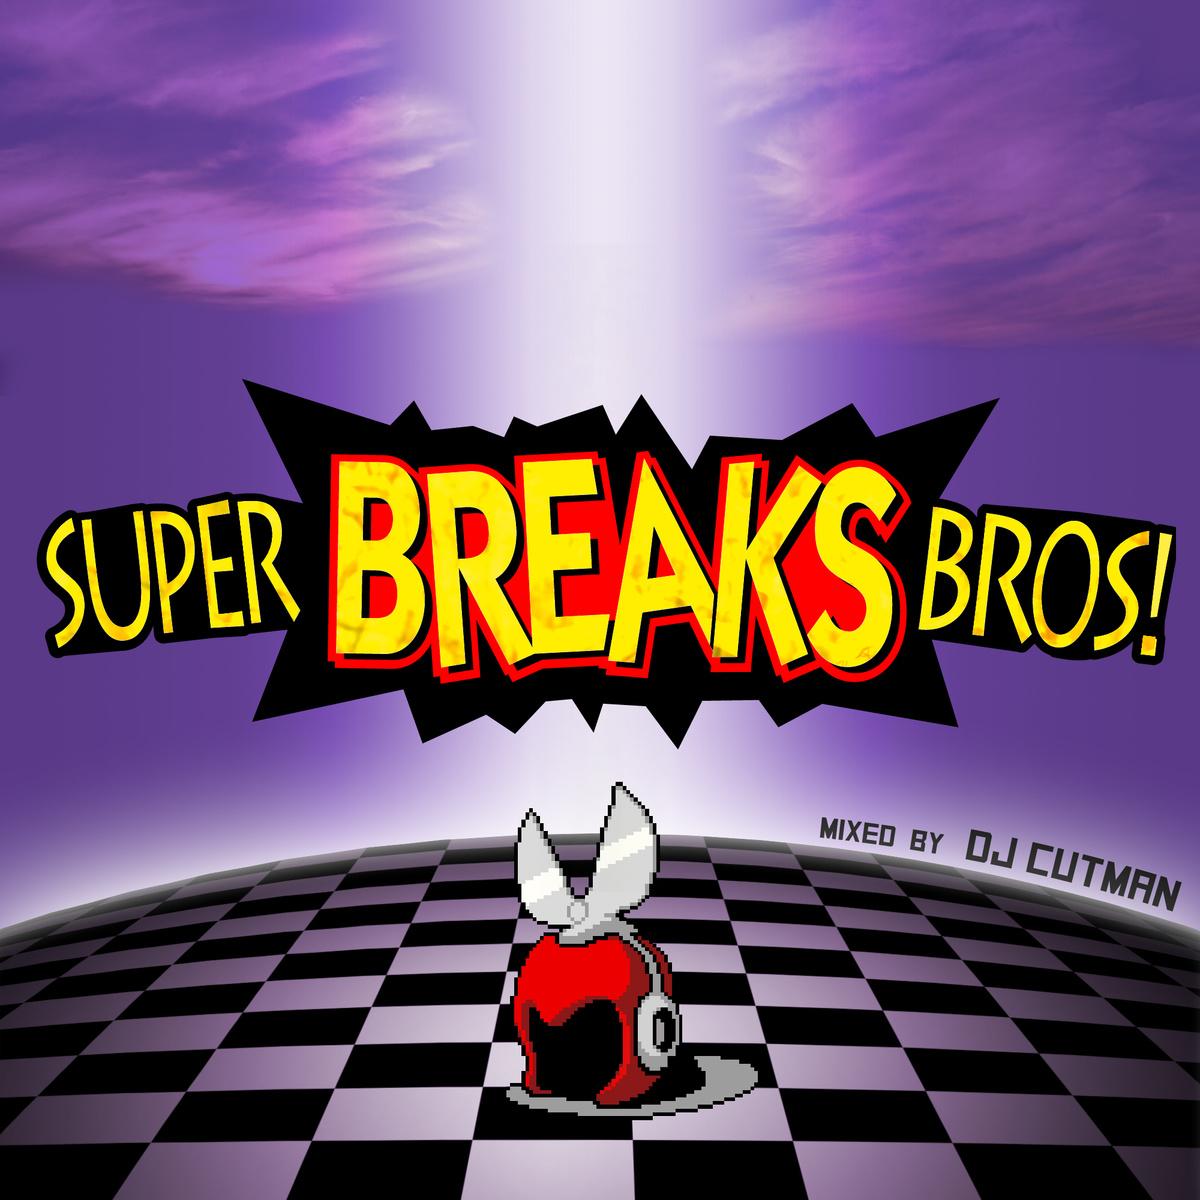 Super BREAKS Bros